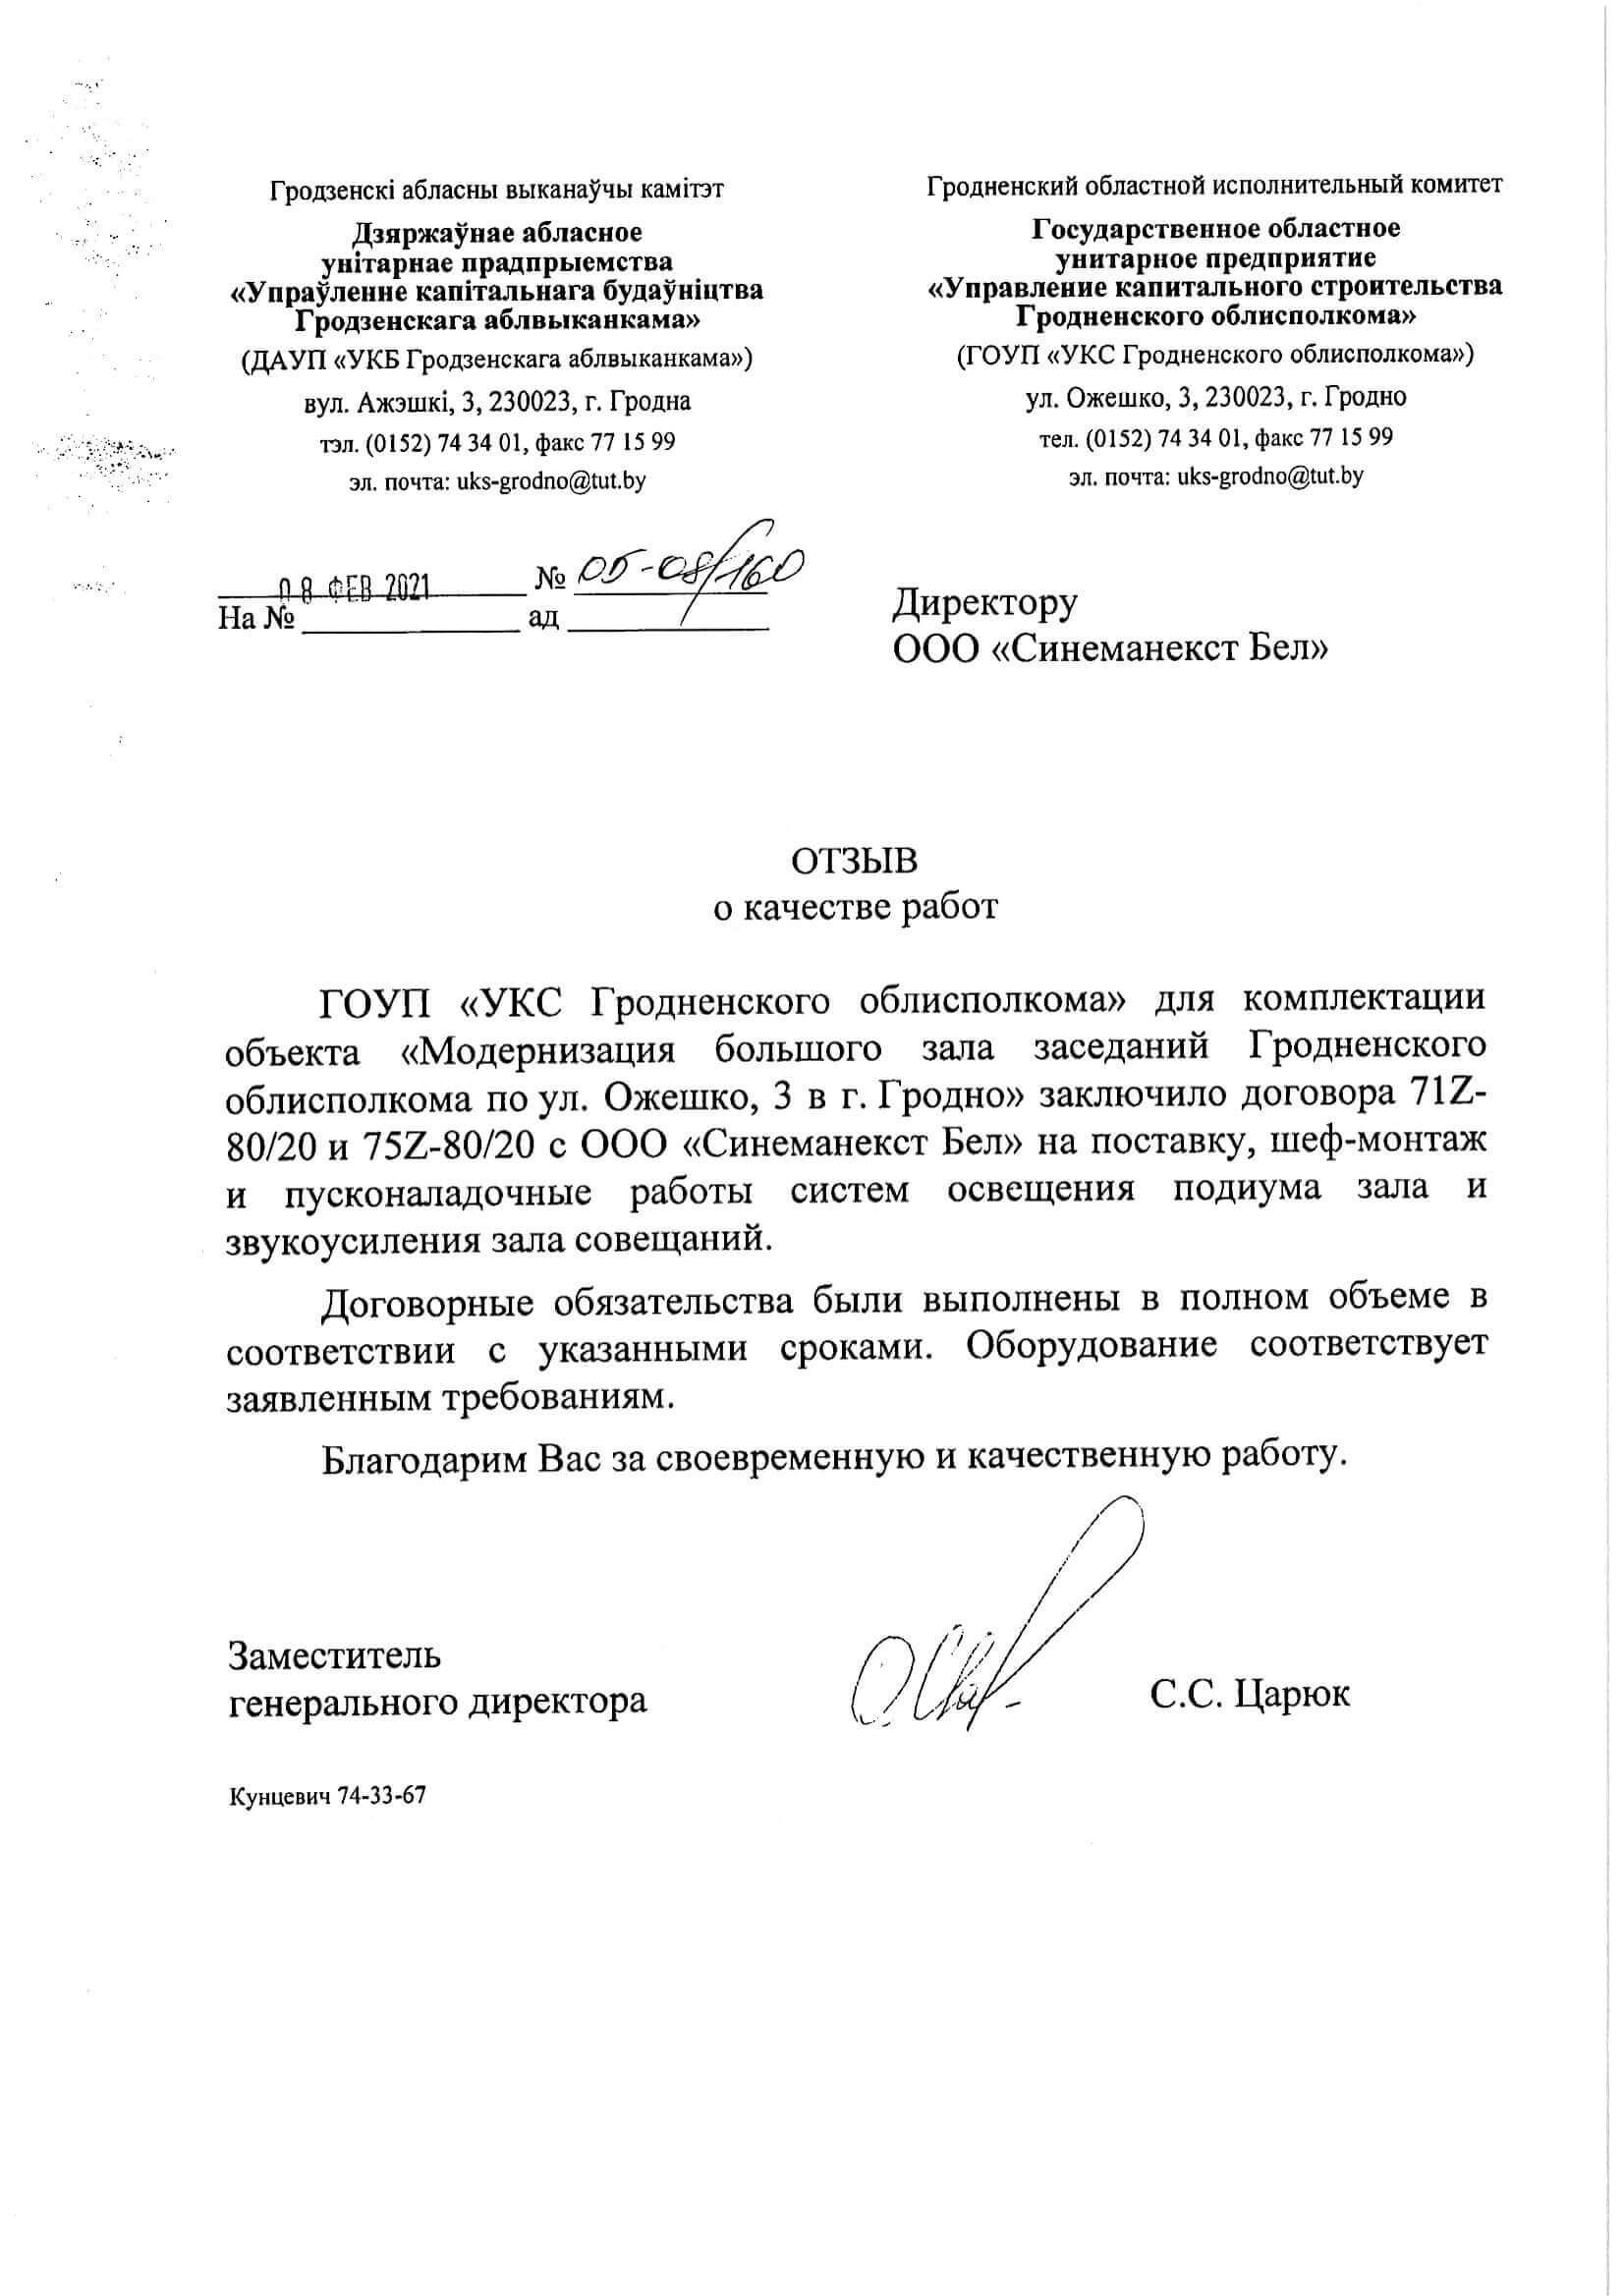 УКС Гродненского облисполкома